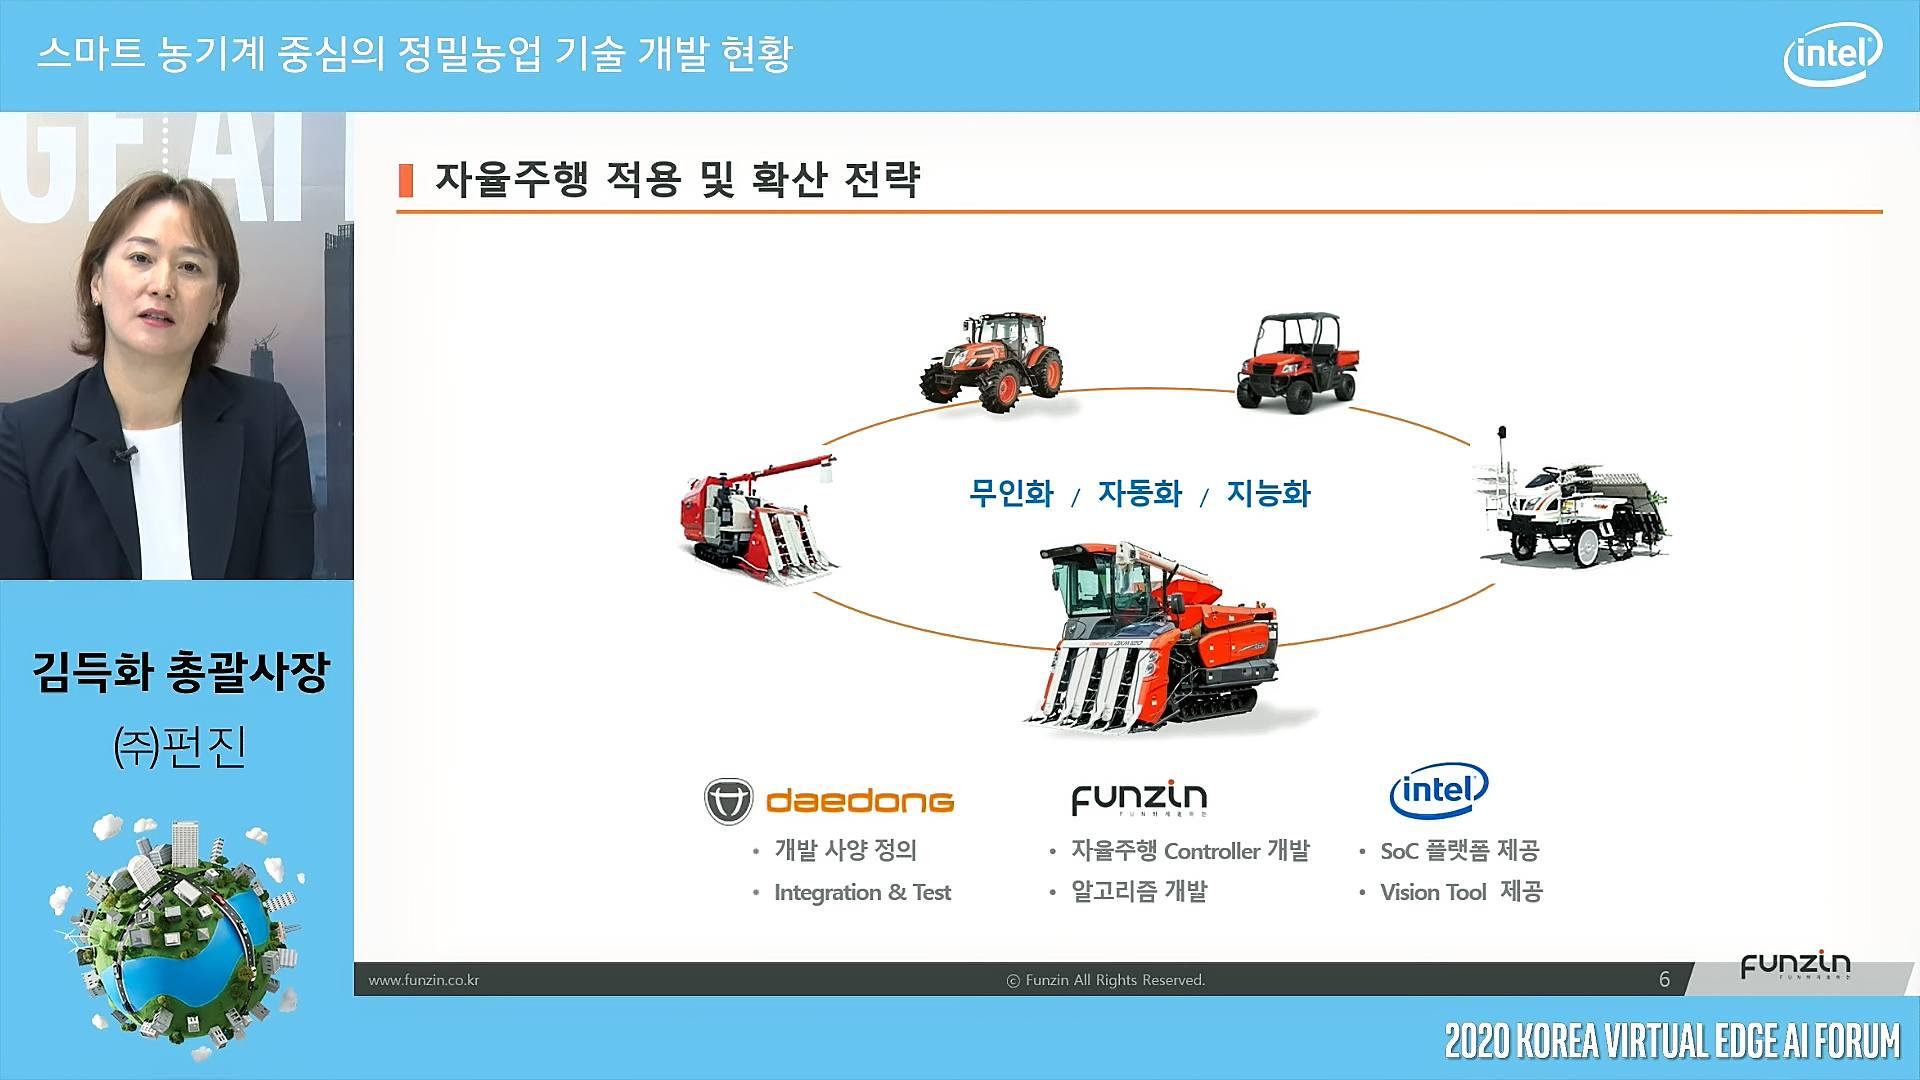 200729_Korea Edge AI Forum_Contents_3